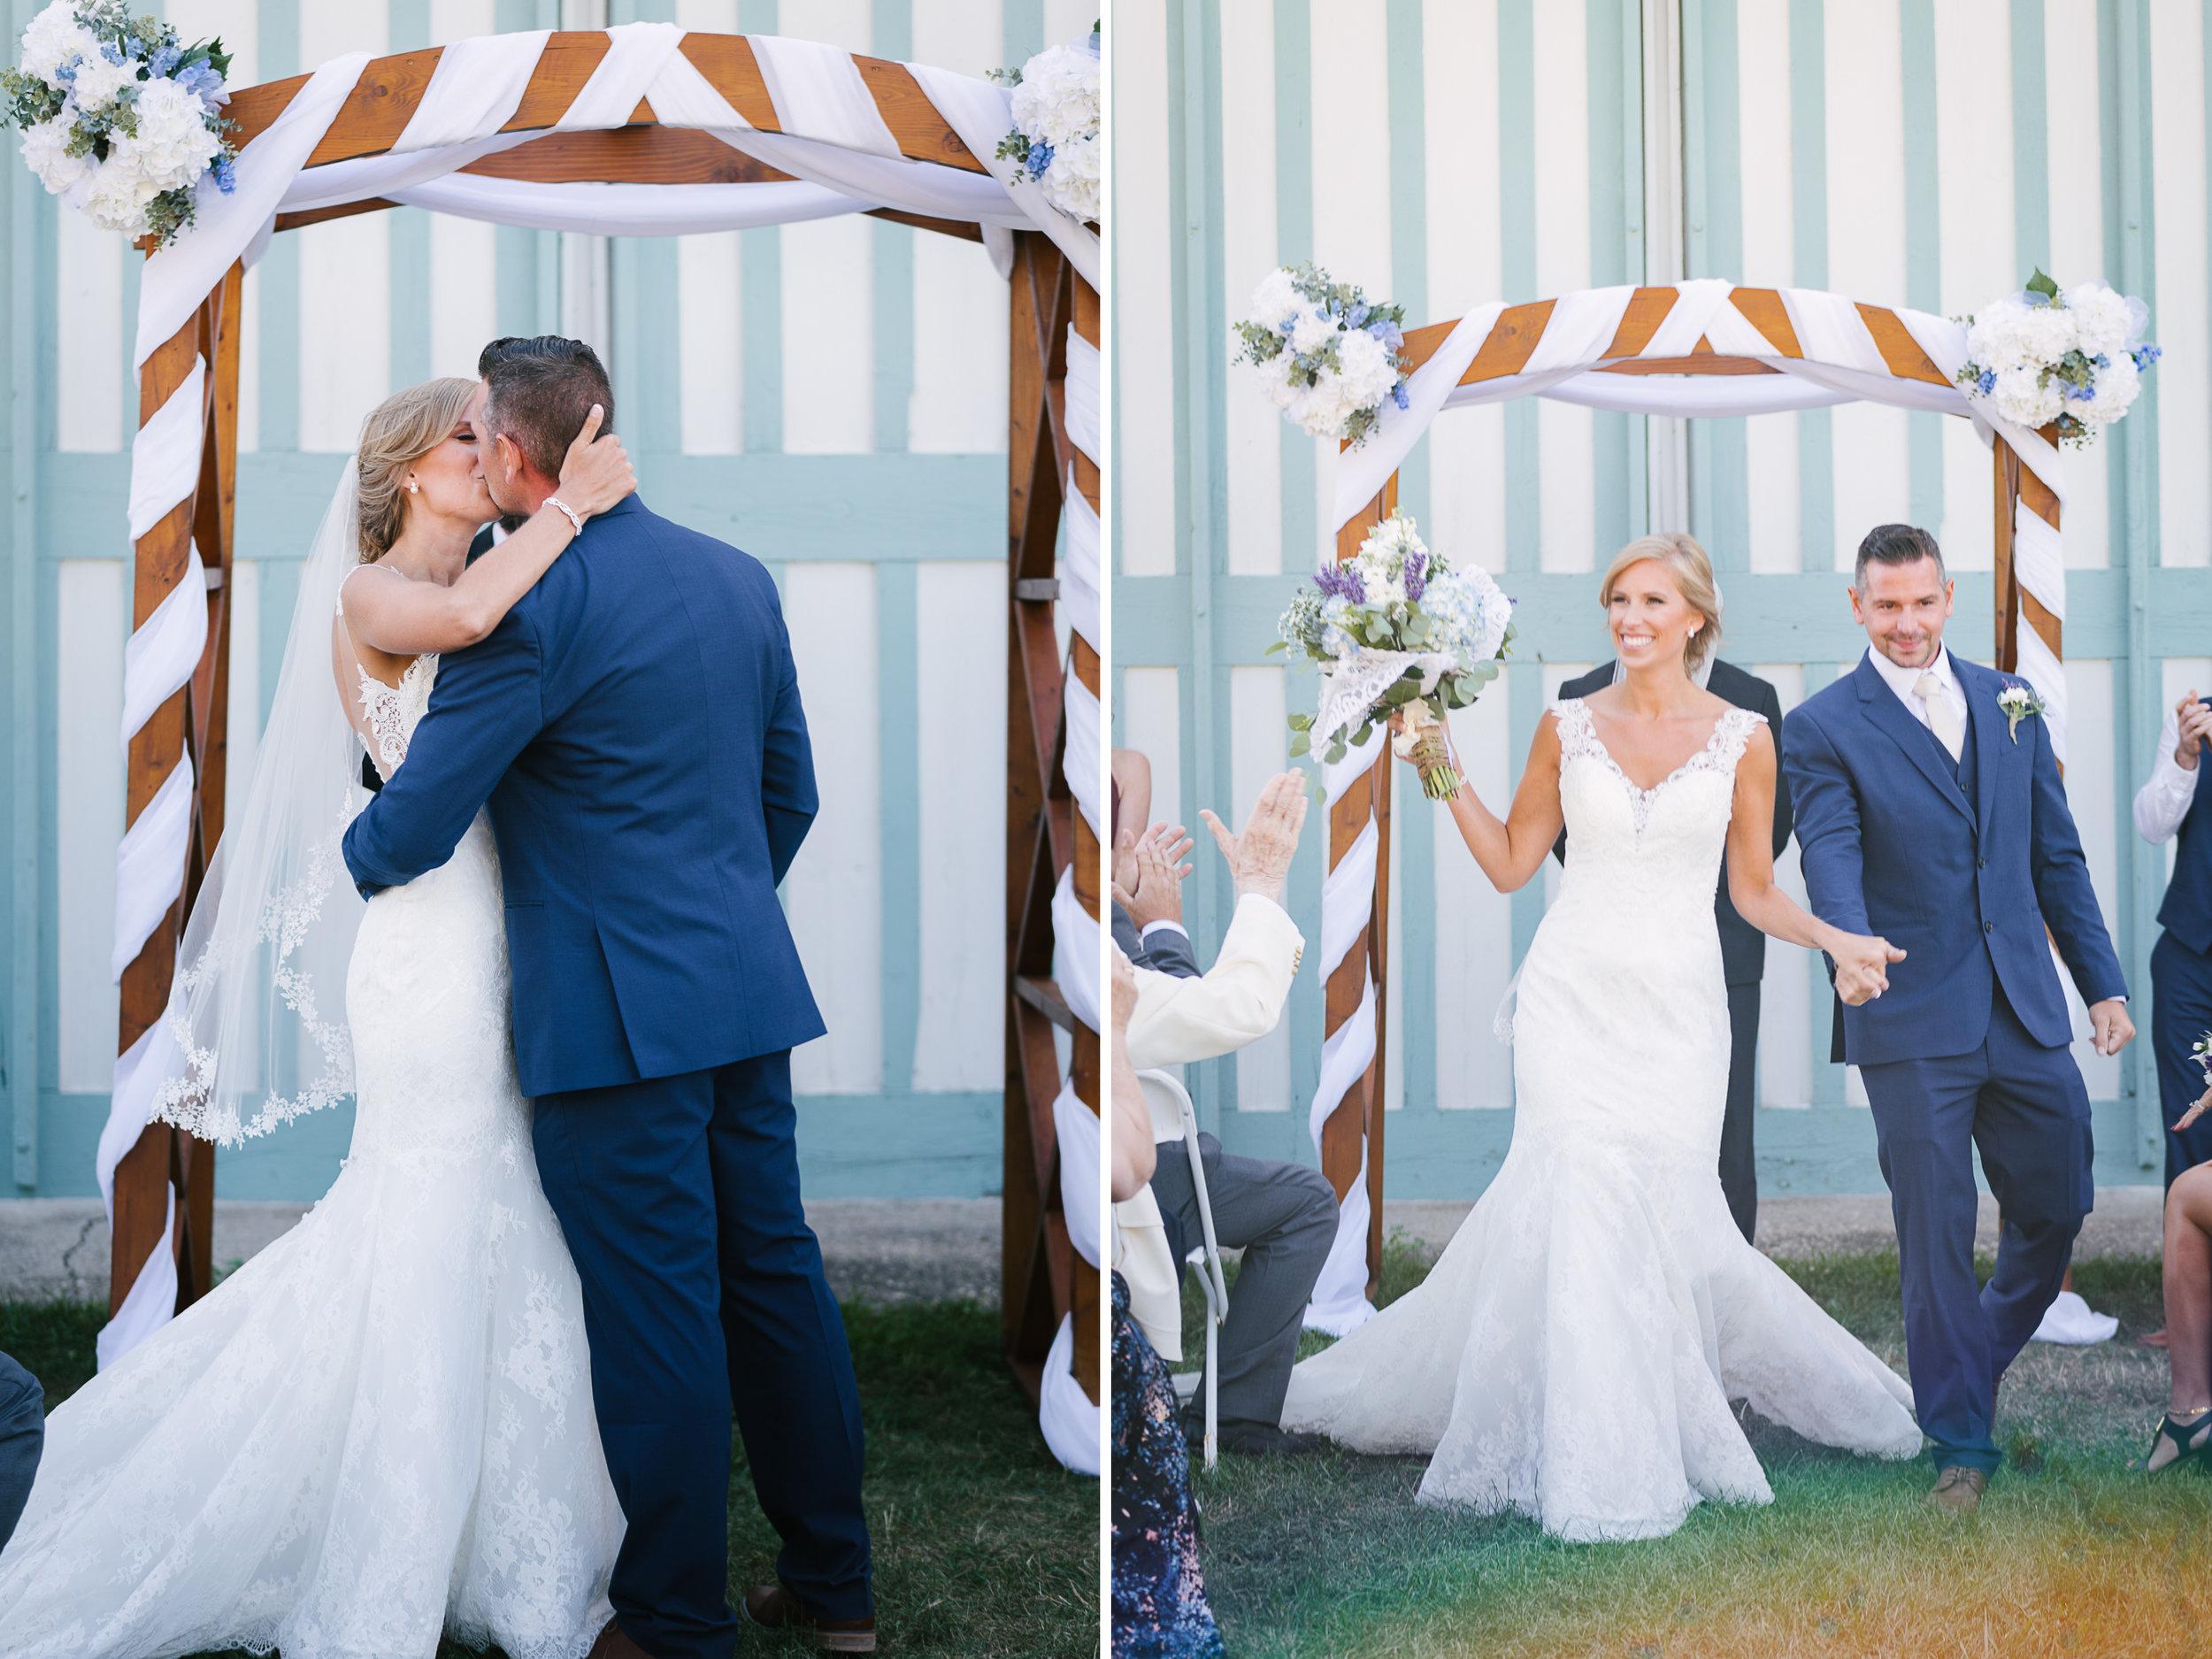 cobblestone-wedding-barn-rochester-photography-18.jpg